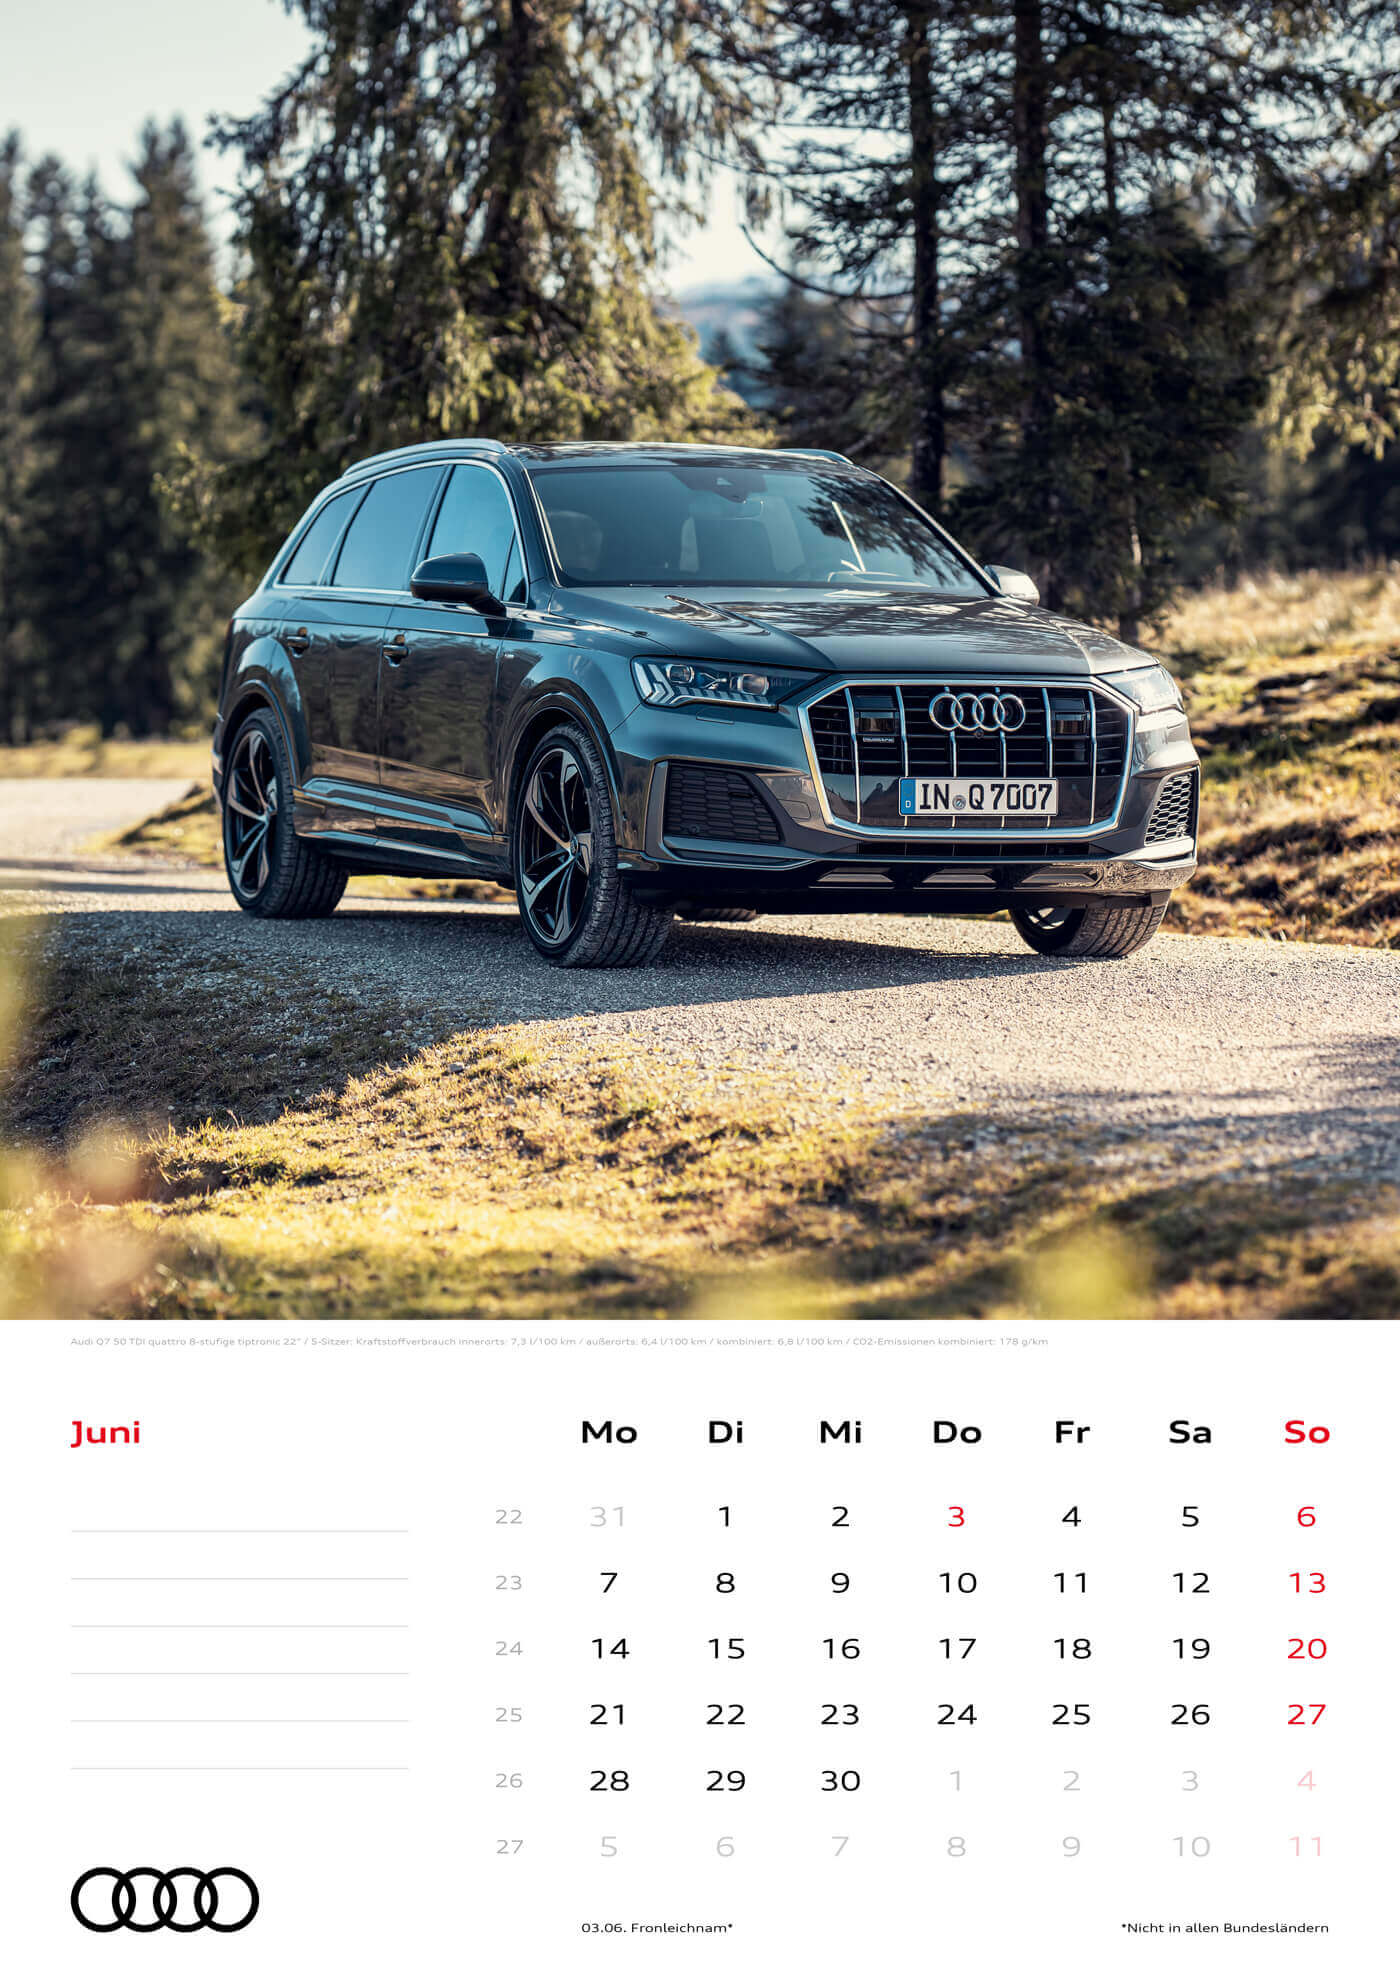 Audi Kalender 2021 - DIN A3 / Audi Q7